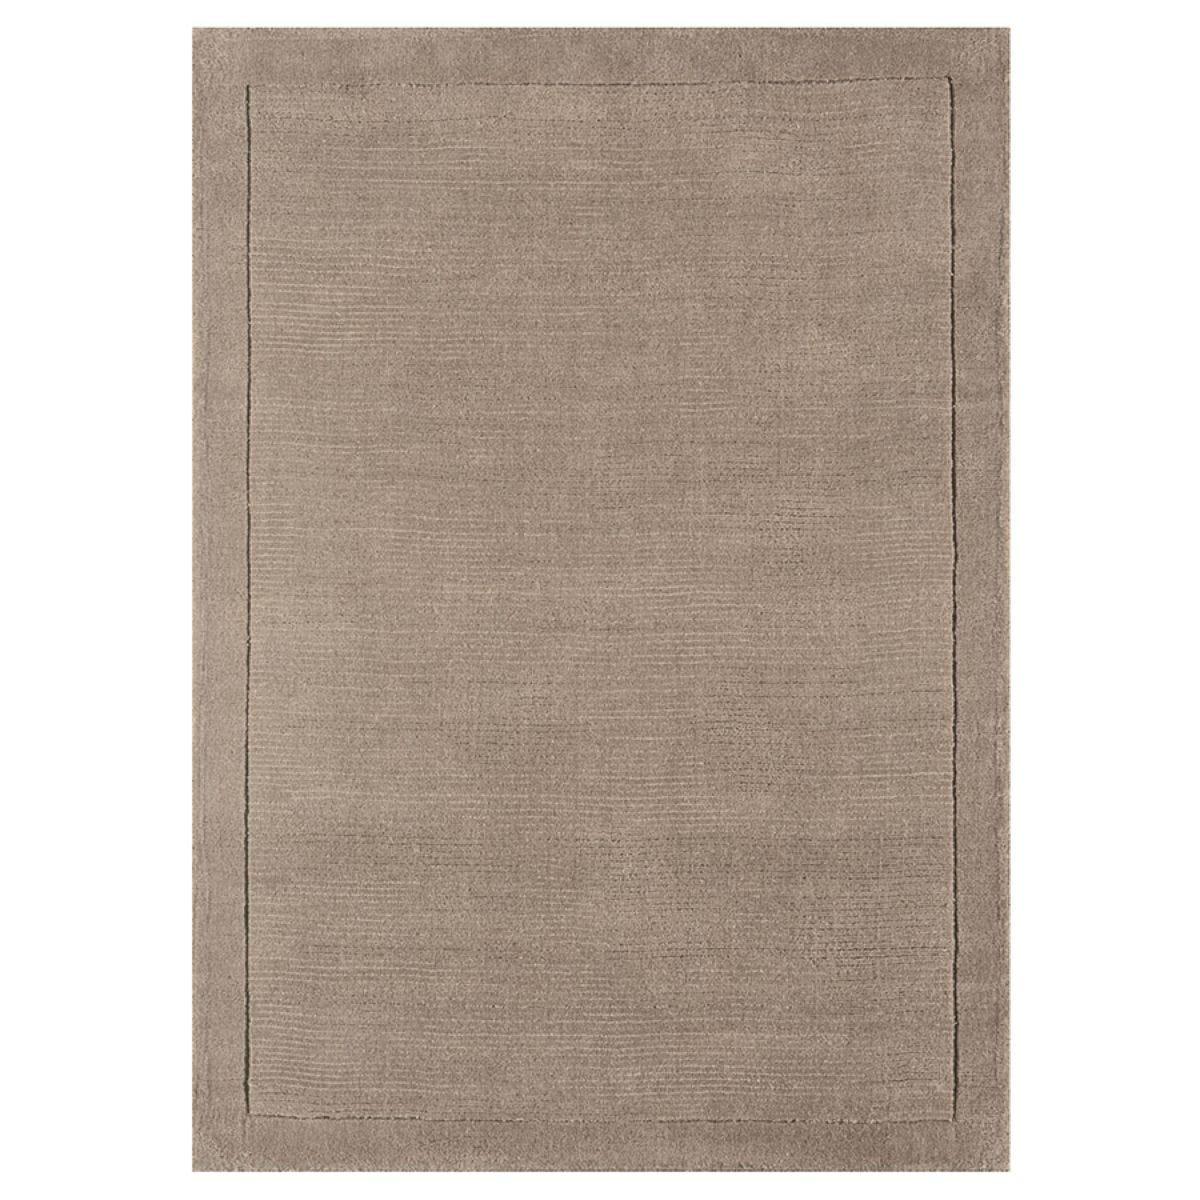 Asiatic York Handloom Rug, 120x170cm